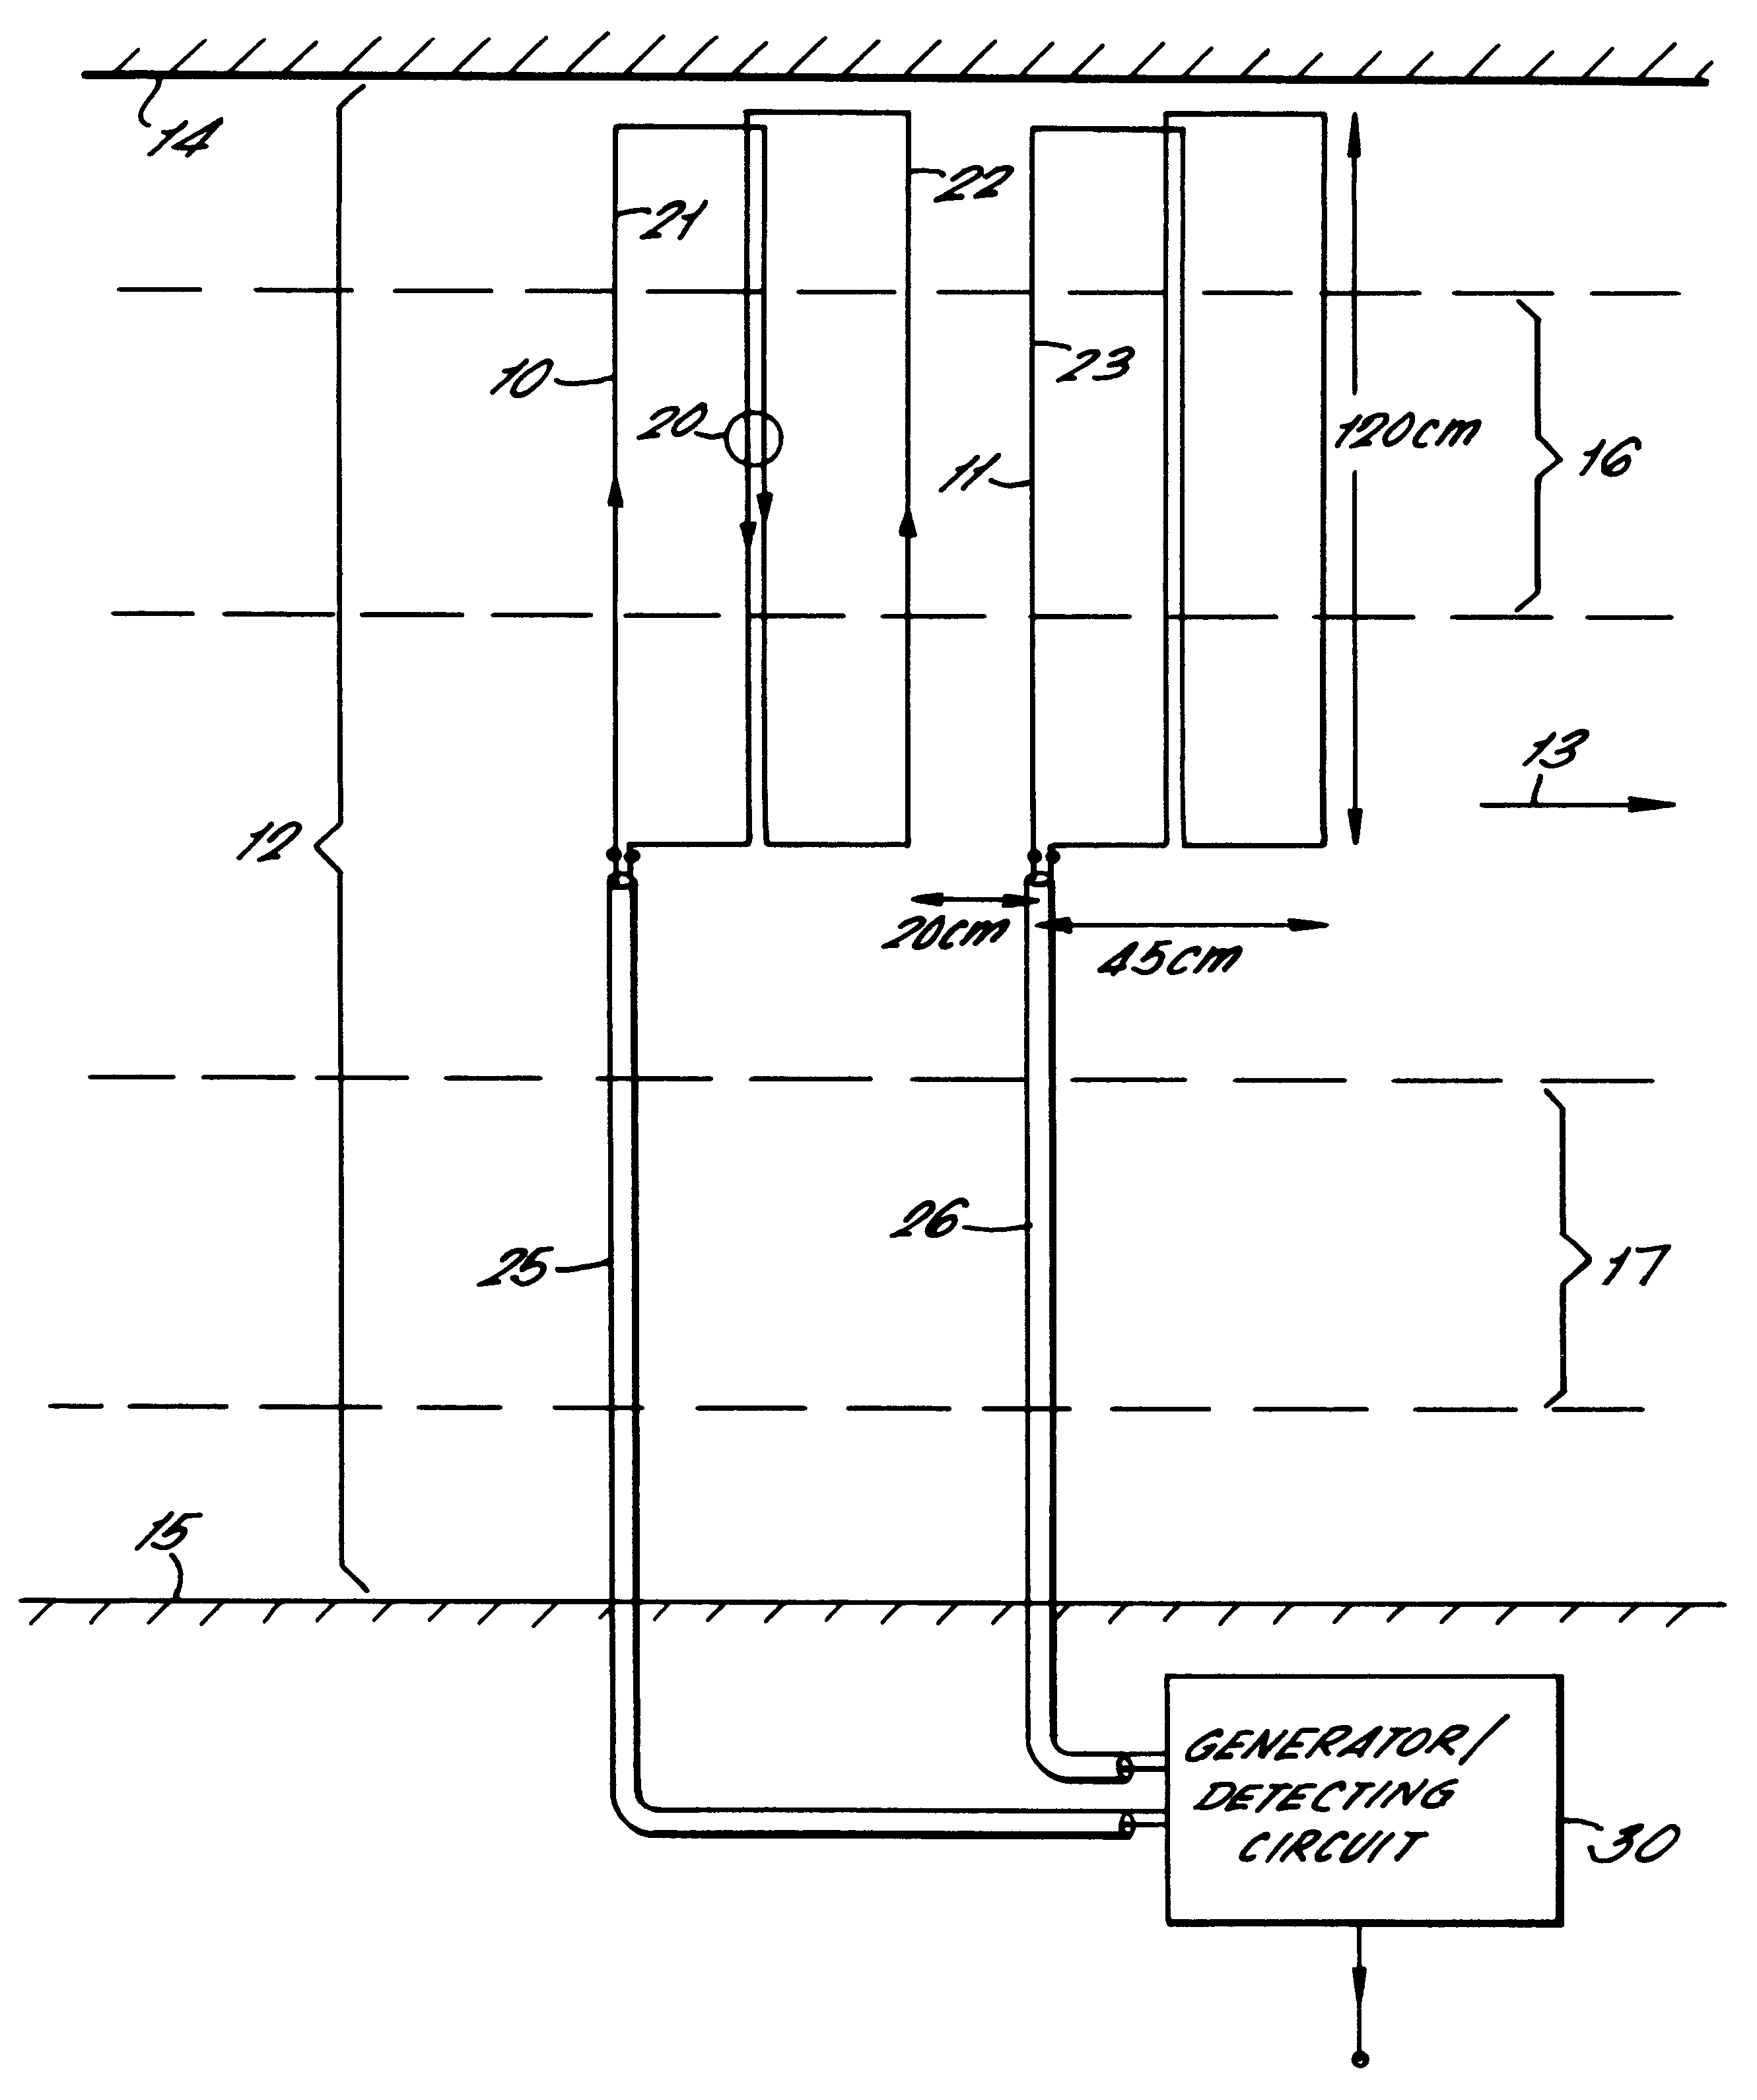 loop detector wiring diagram wiring diagram patent us6337640 inductive loop sensor for traffic detection us06337640 20020108 d00000 trafficware detector wiring diagram